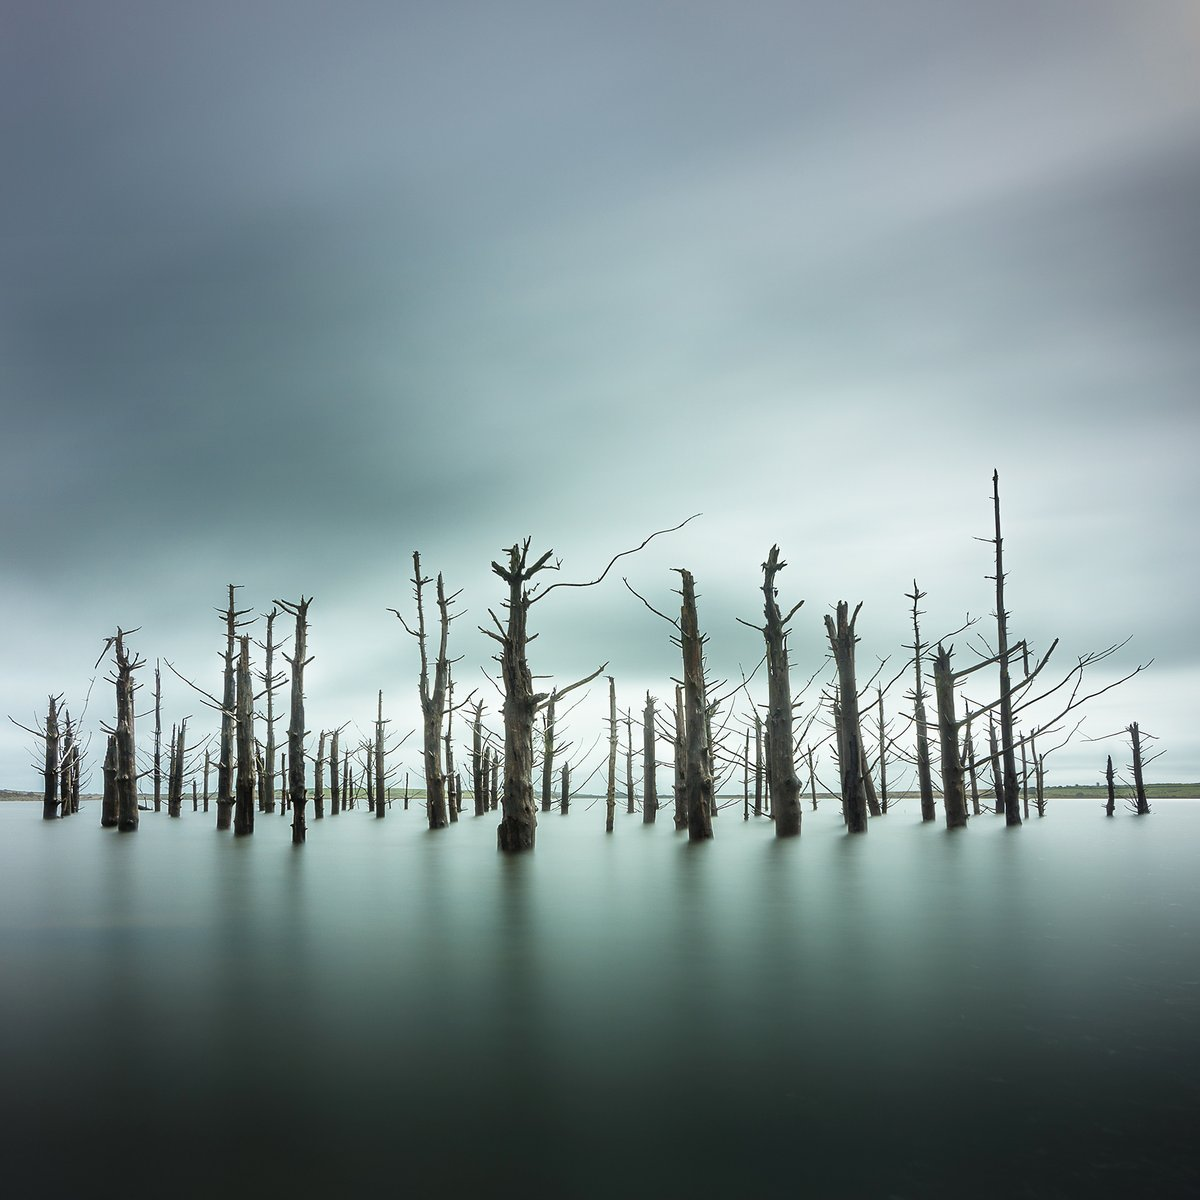 Dramatic deadwood, courtesy of @Nickgreen01Nick. A strong #WexMondays shortlister https://t.co/6gyfa2T3VS